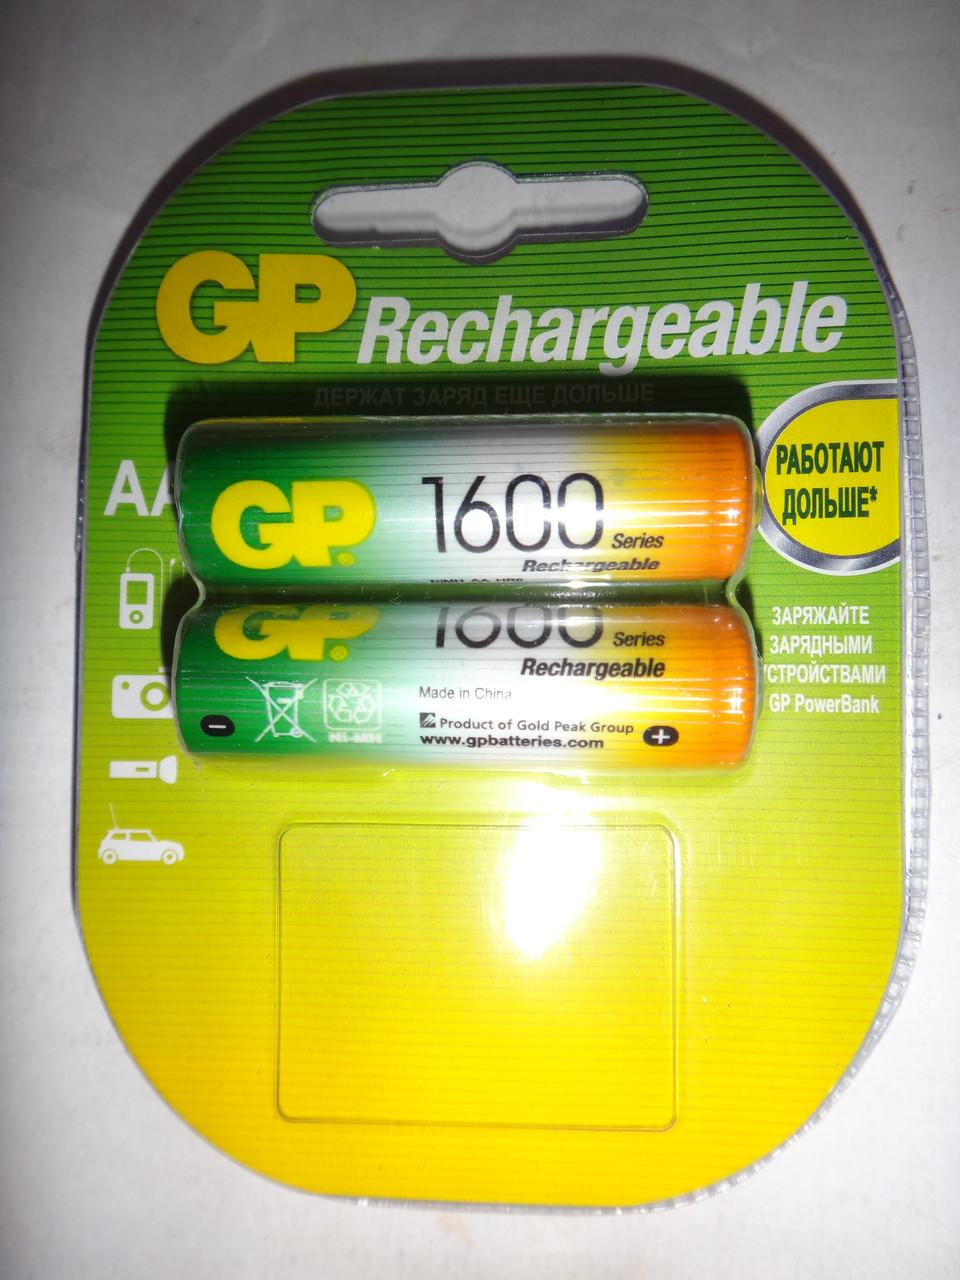 Аккумулятор GP AA 1600 rechargeable Батарейка Новое поколение 2017